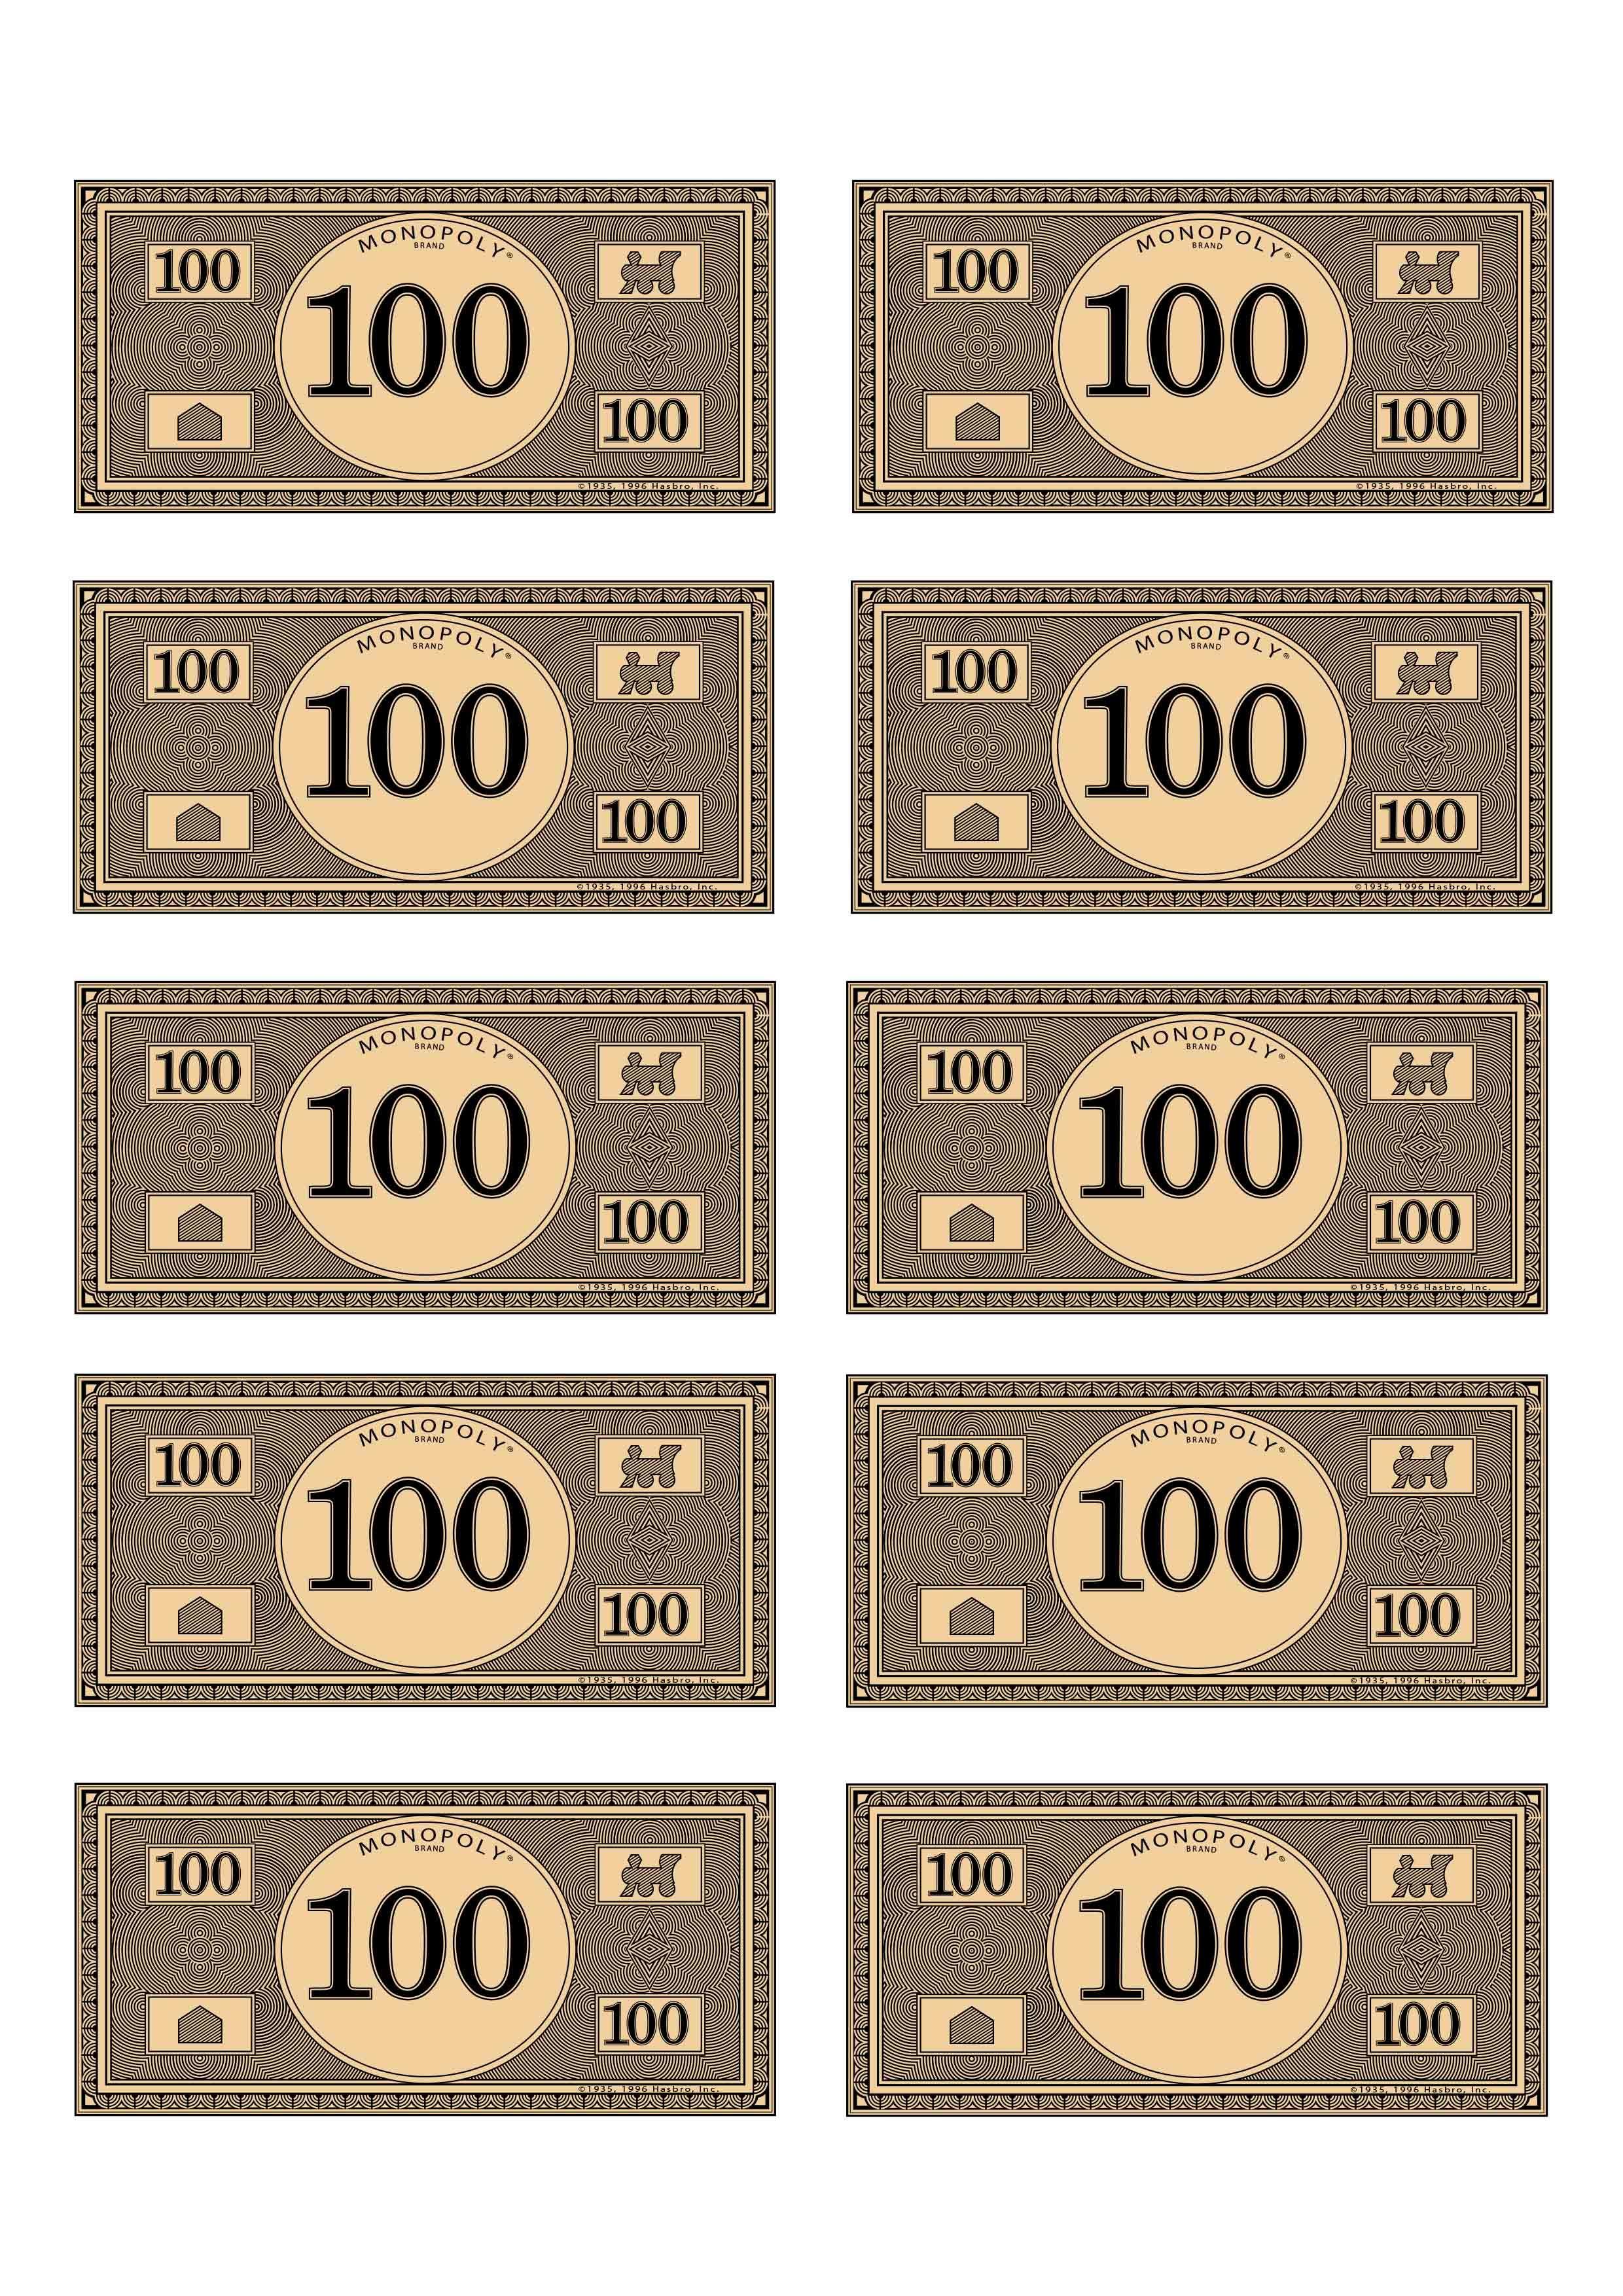 picture regarding Monopoly Money Printable identify monopoly monetary 100 Spending budget$ Monopoly economical, Monetary